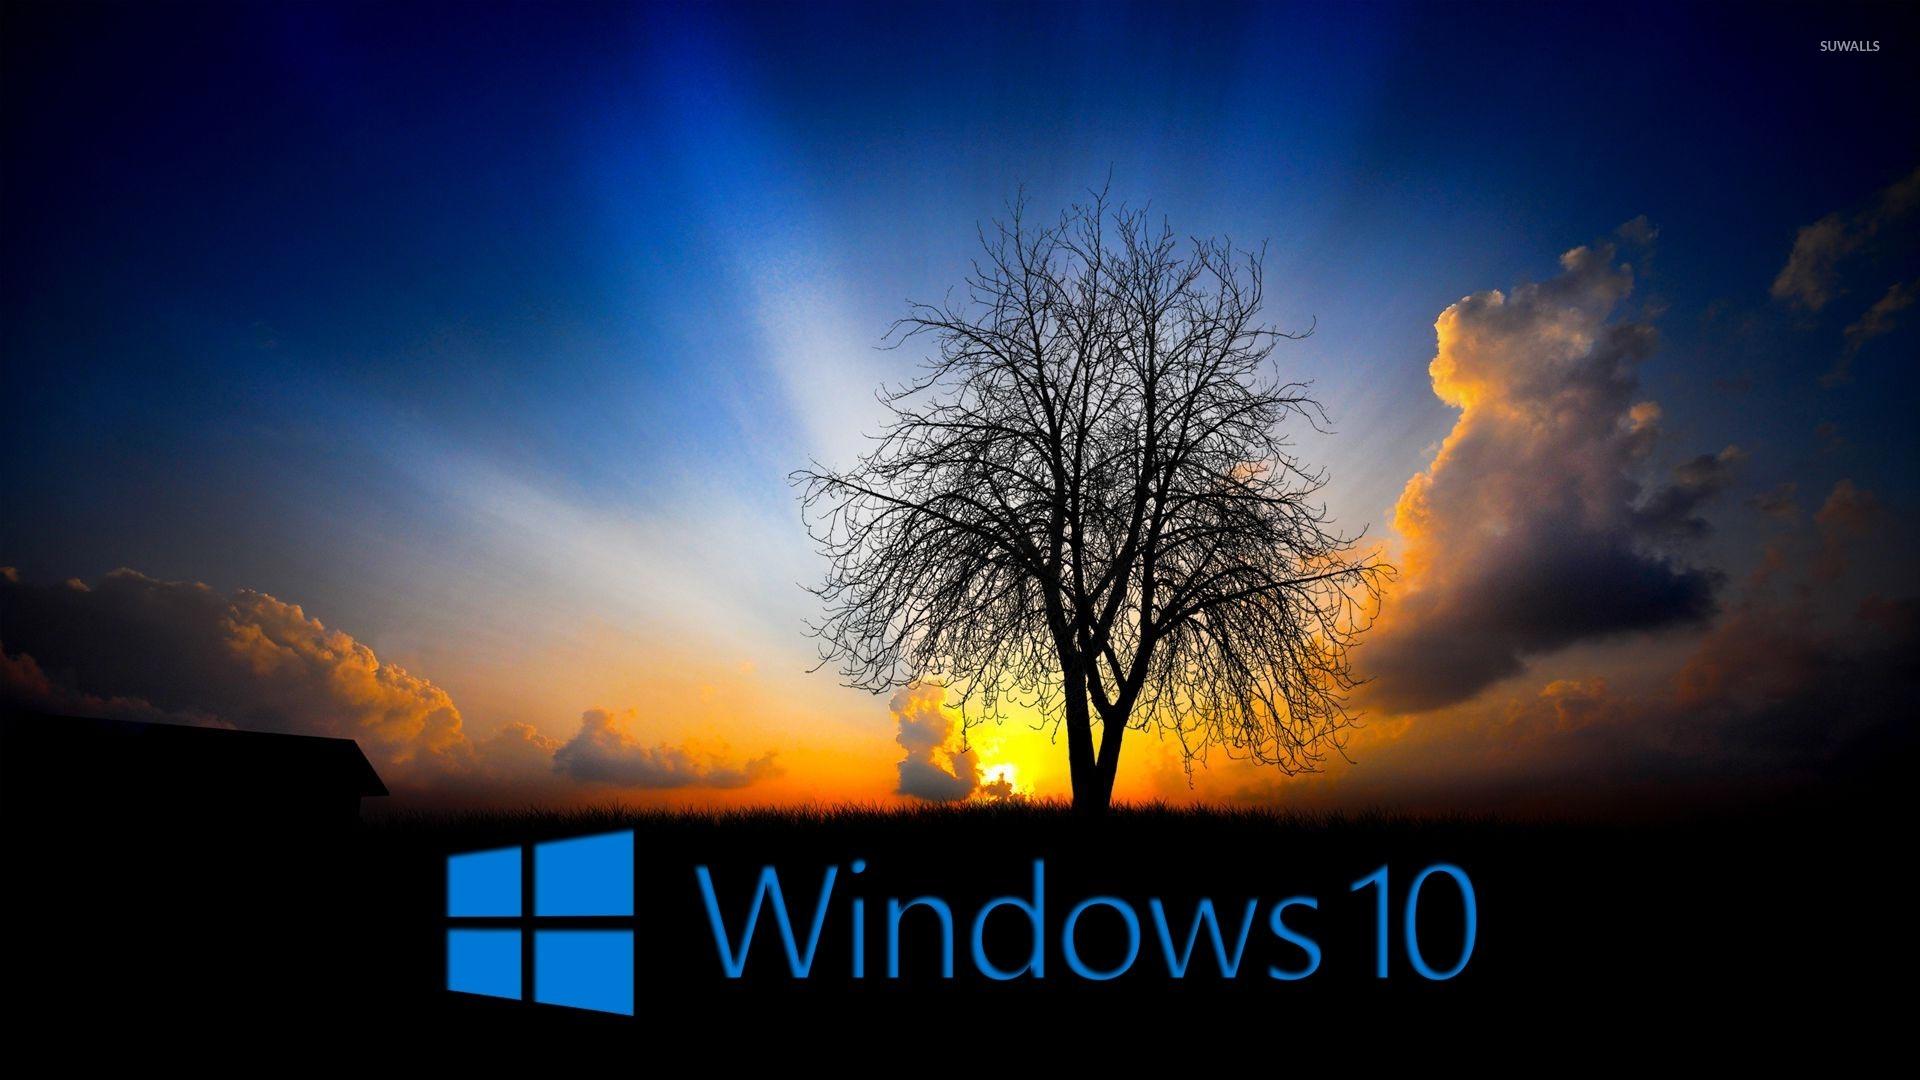 Windows 10 in the twilight wallpaper   Computer wallpapers   48476 1680x1050